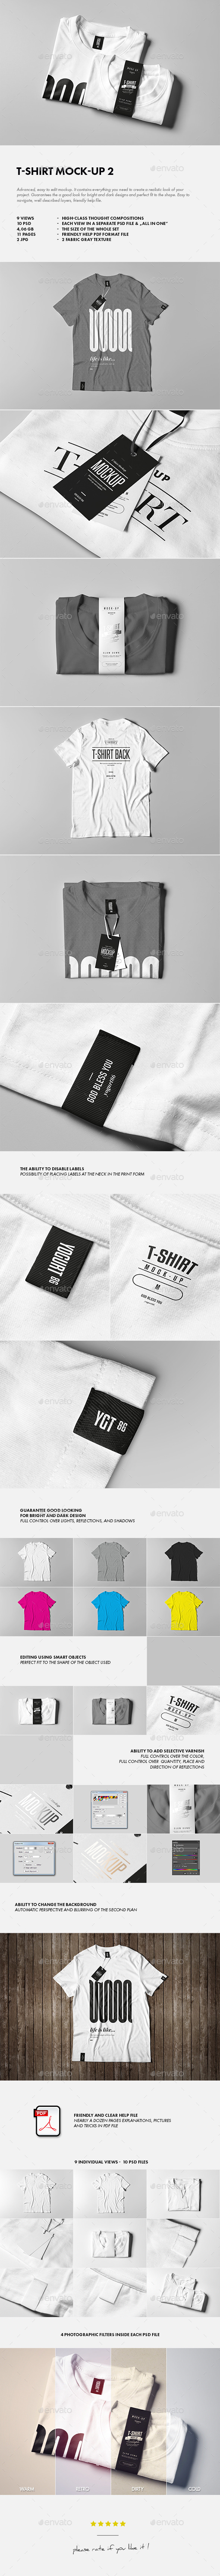 http://yogurt86.com/min/Branding-Identity-Mock-up.jpg